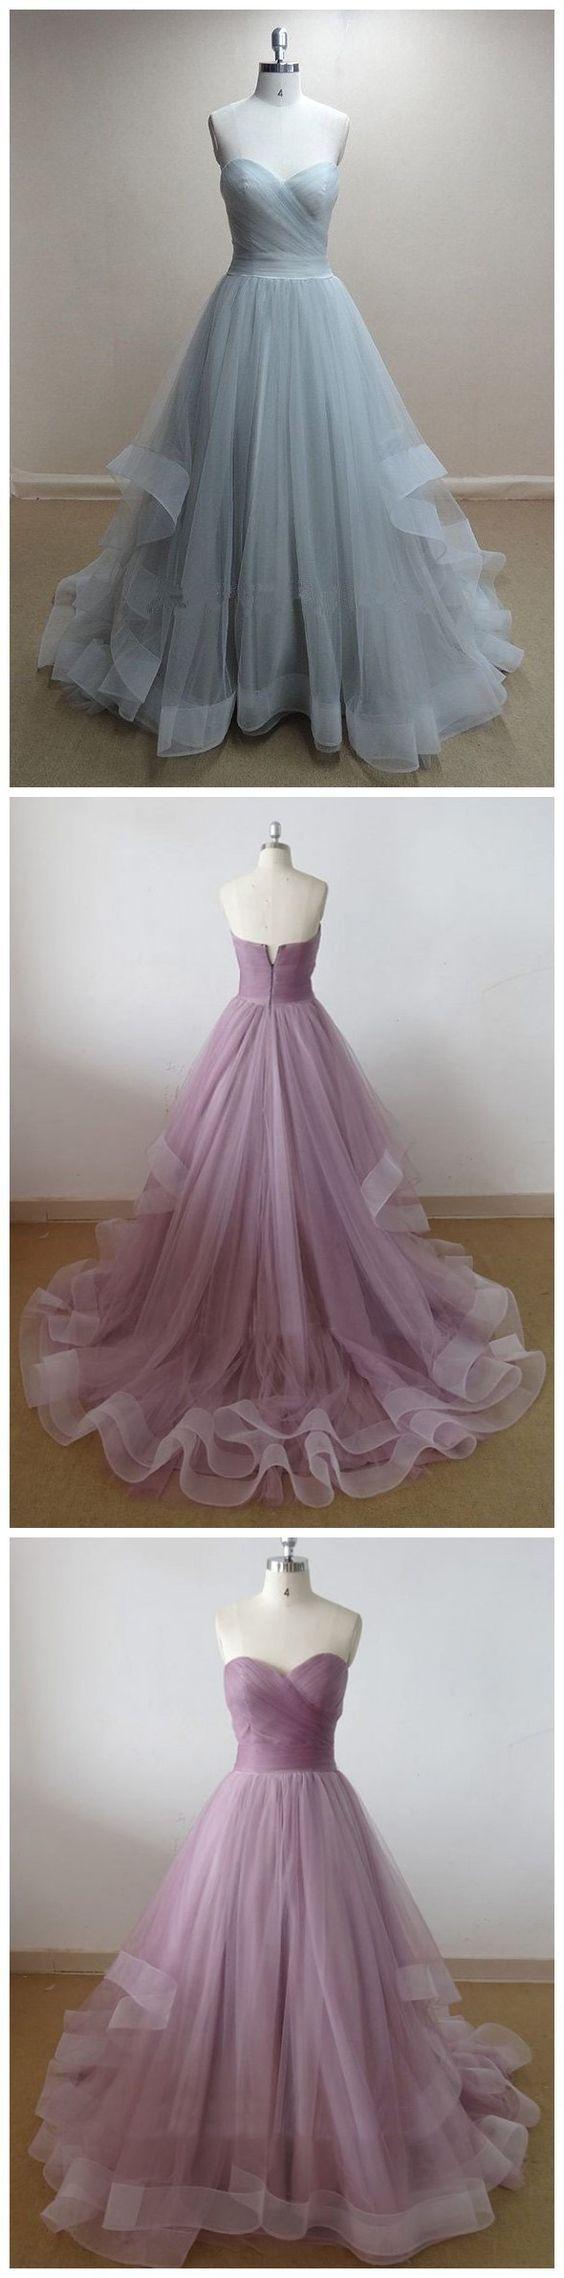 Charming Prom Dress,Long Prom Dress,Evening Formal Dress